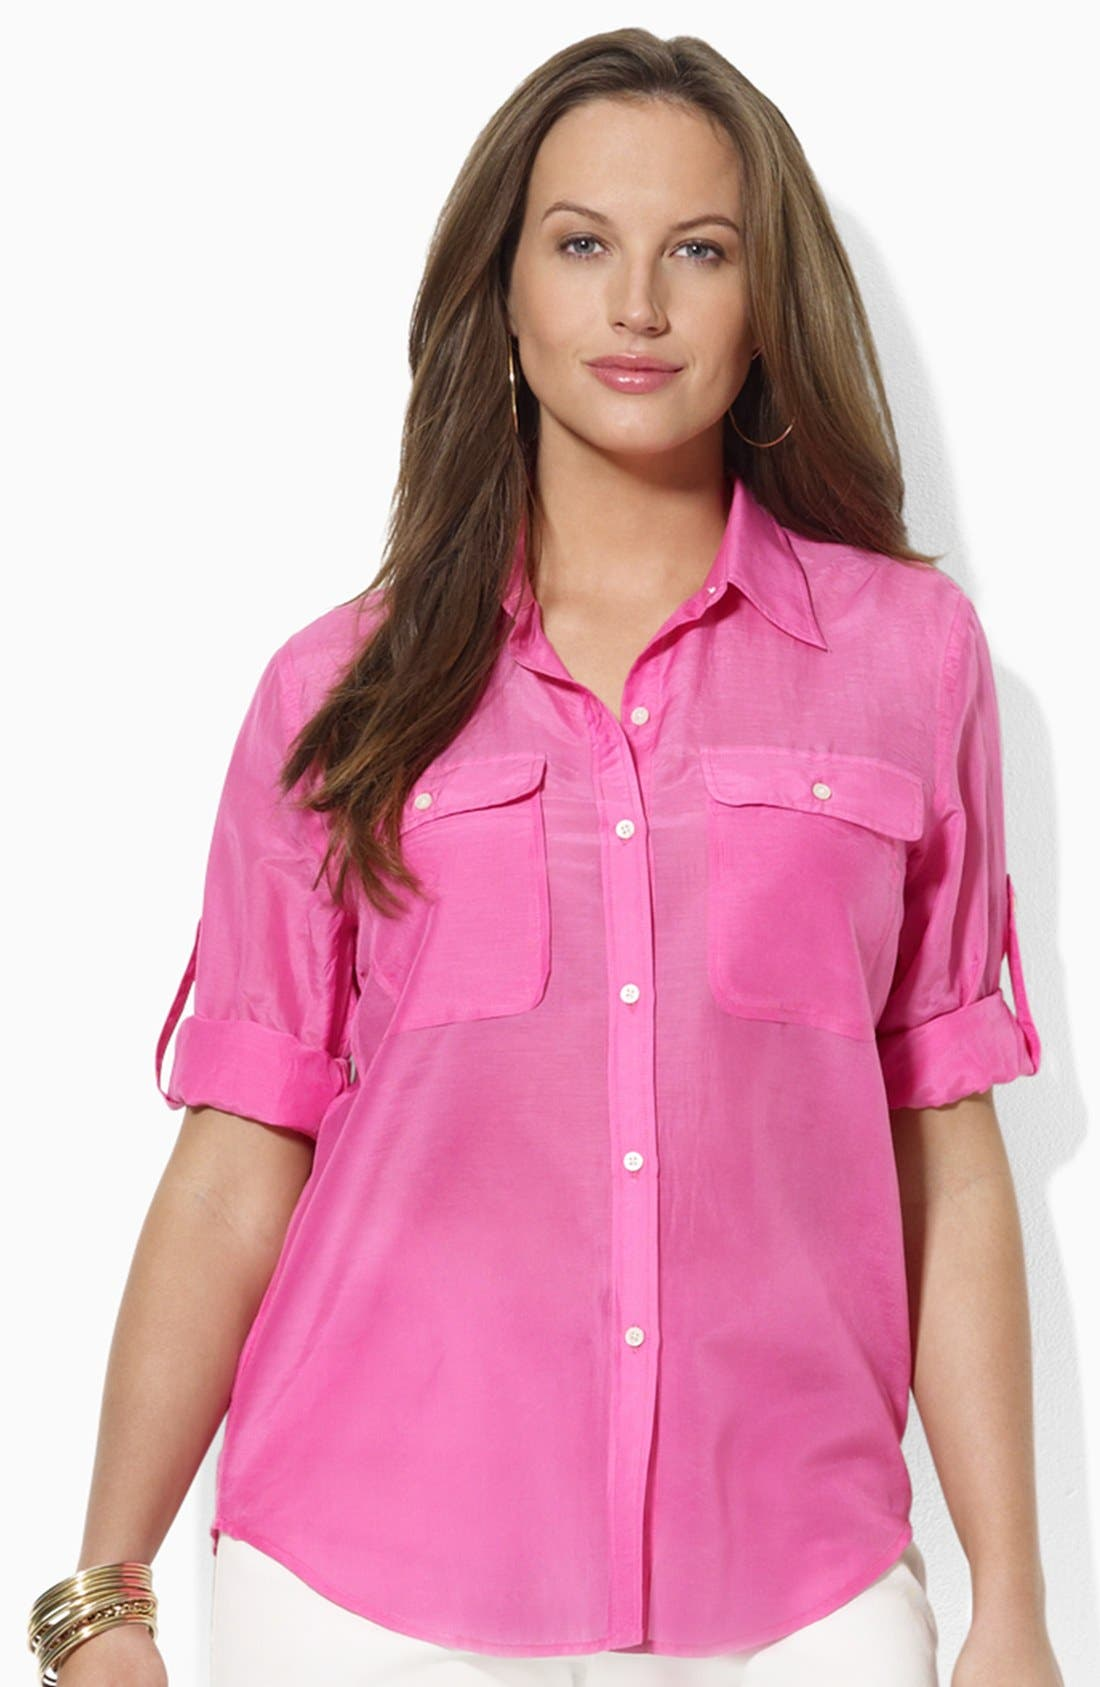 Alternate Image 1 Selected - Lauren Ralph Lauren Cotton & Silk Work Shirt (Plus)